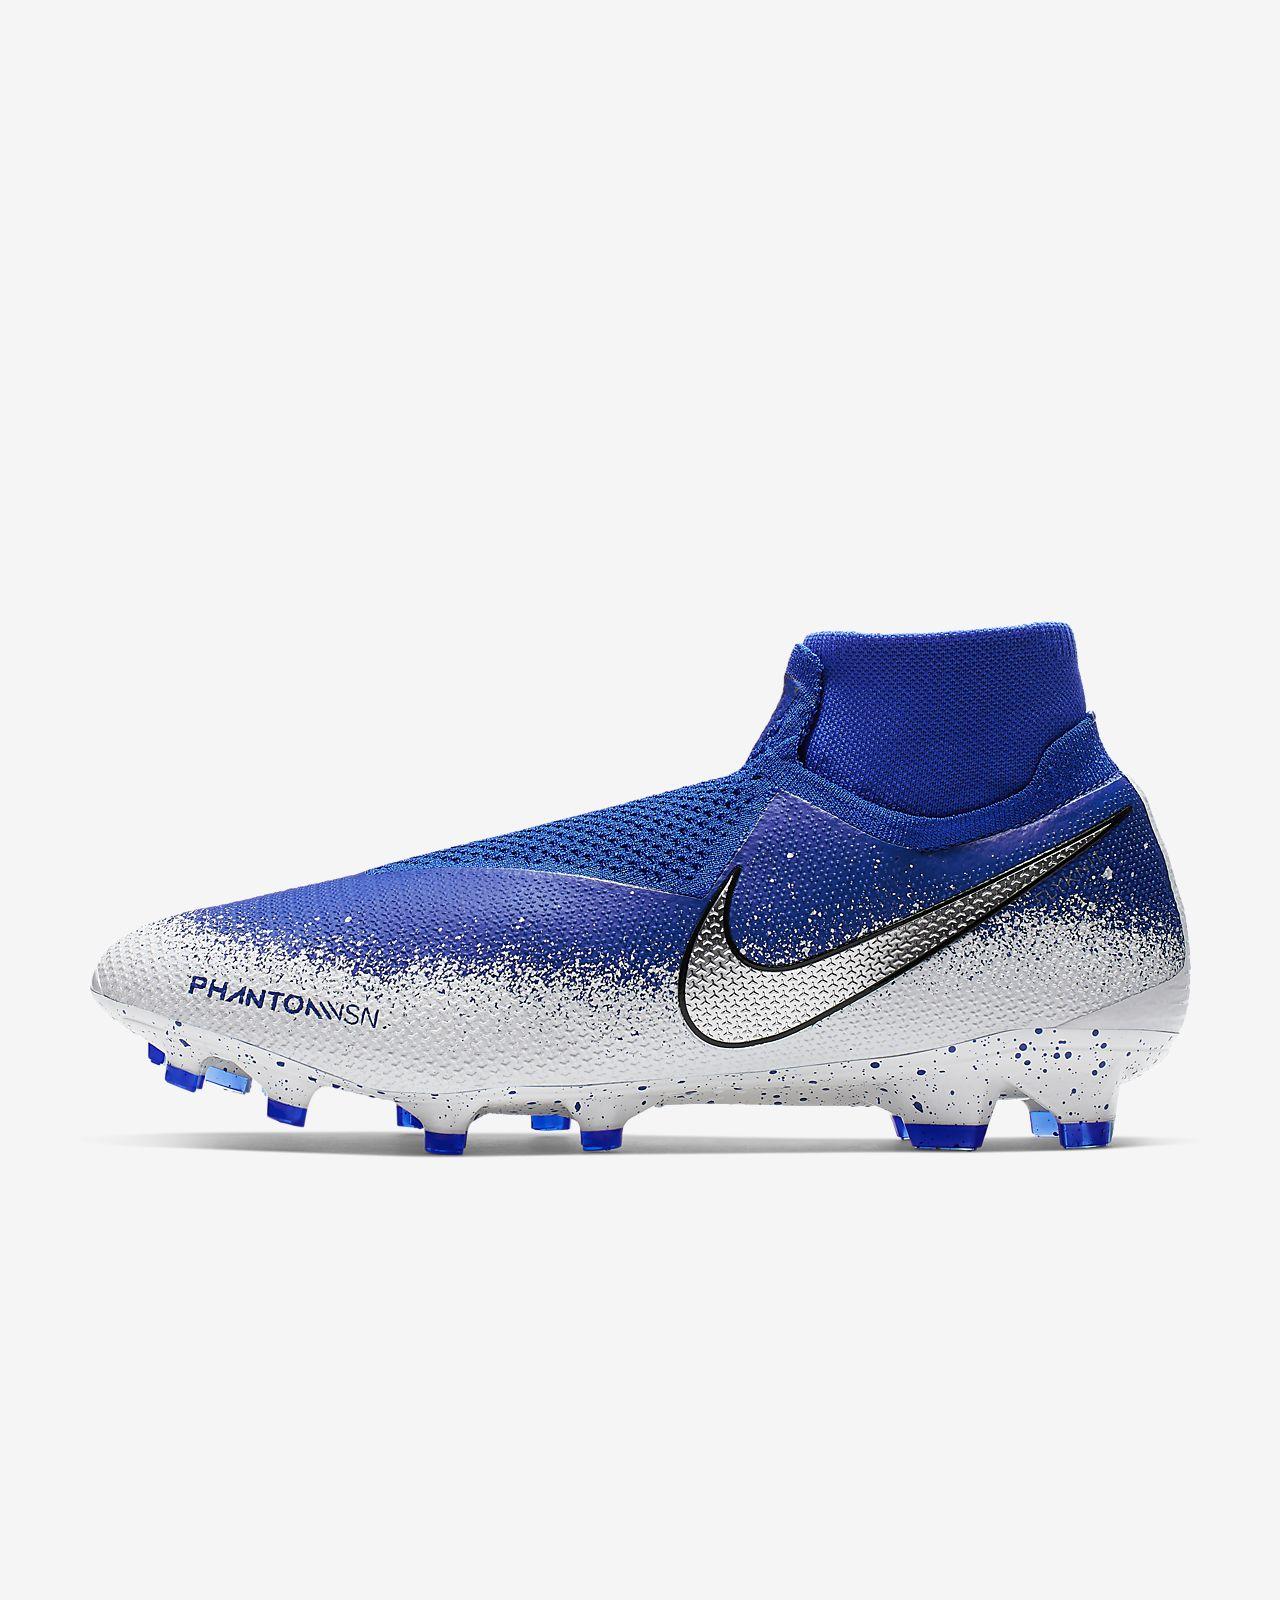 Nike Phantom Vision Elite Dynamic Fit FG Firm-Ground Soccer Cleat